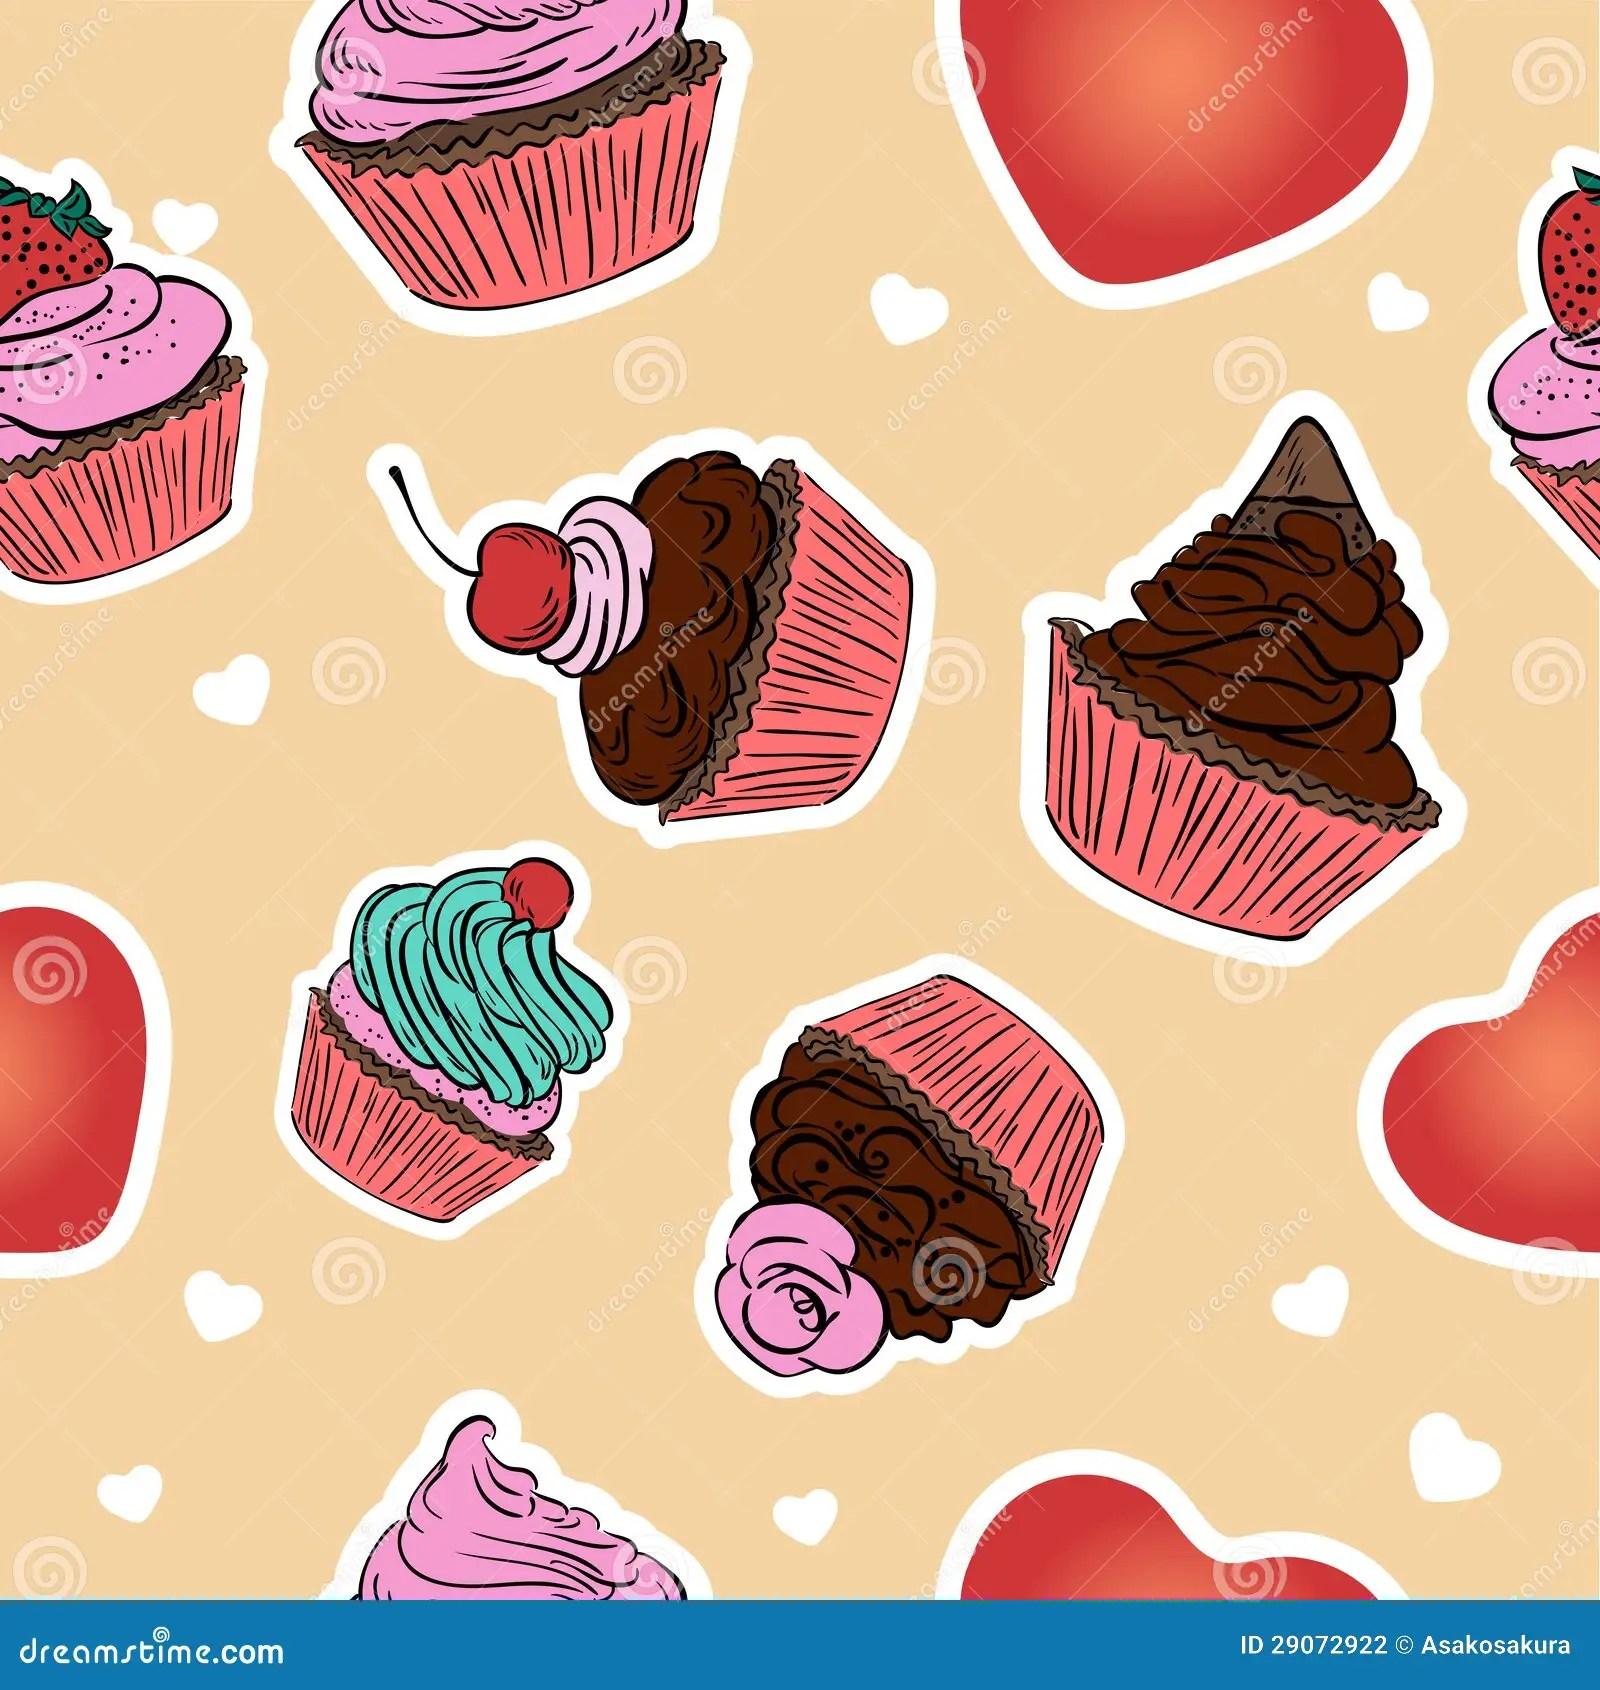 Sweet Baby Girl Wallpaper Free Download Seamless Cupcake Pattern Hand Drawn Background Stock